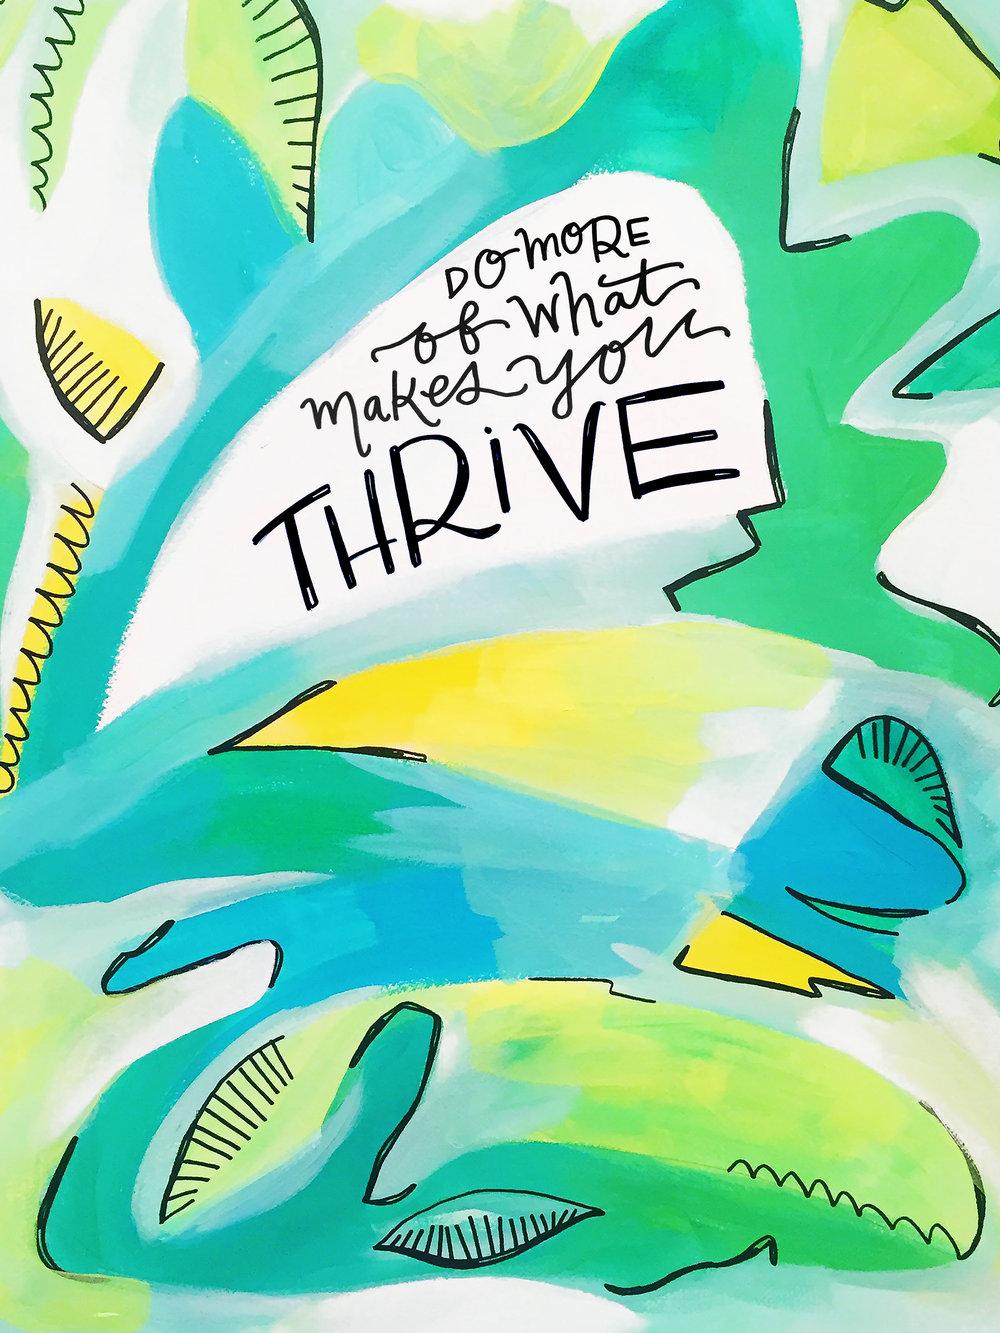 1/8/16: Thrive